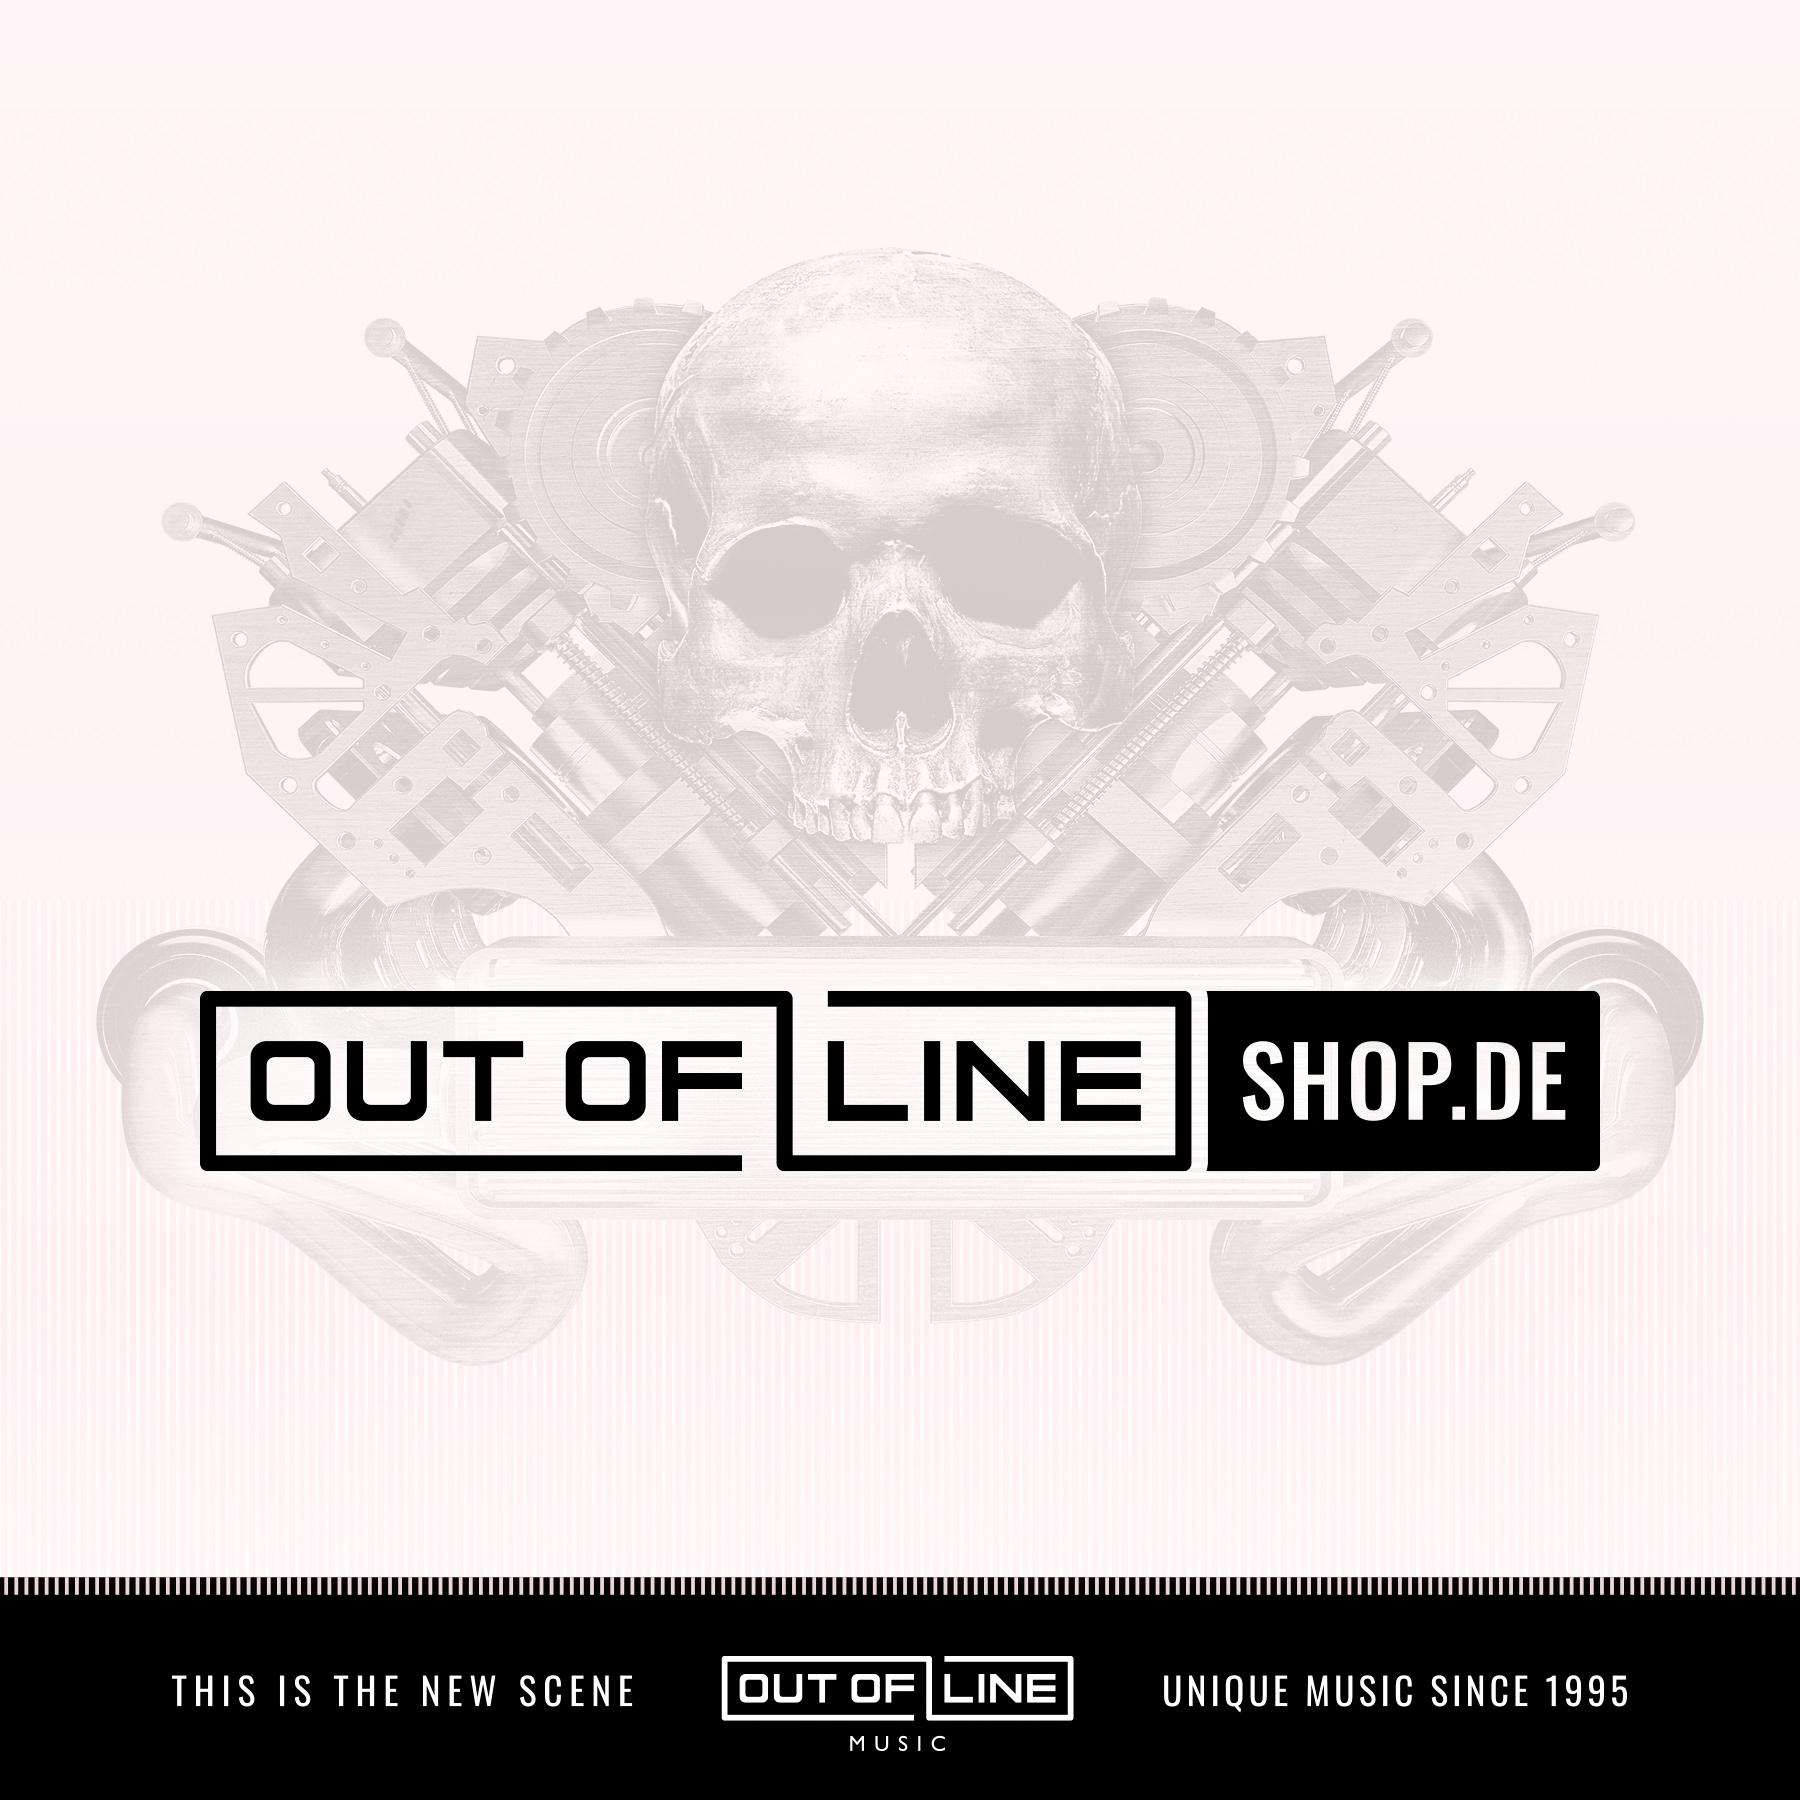 Black Nail Cabaret - Gods Verging On Sanity (Limited Gold Vinyl) - LP